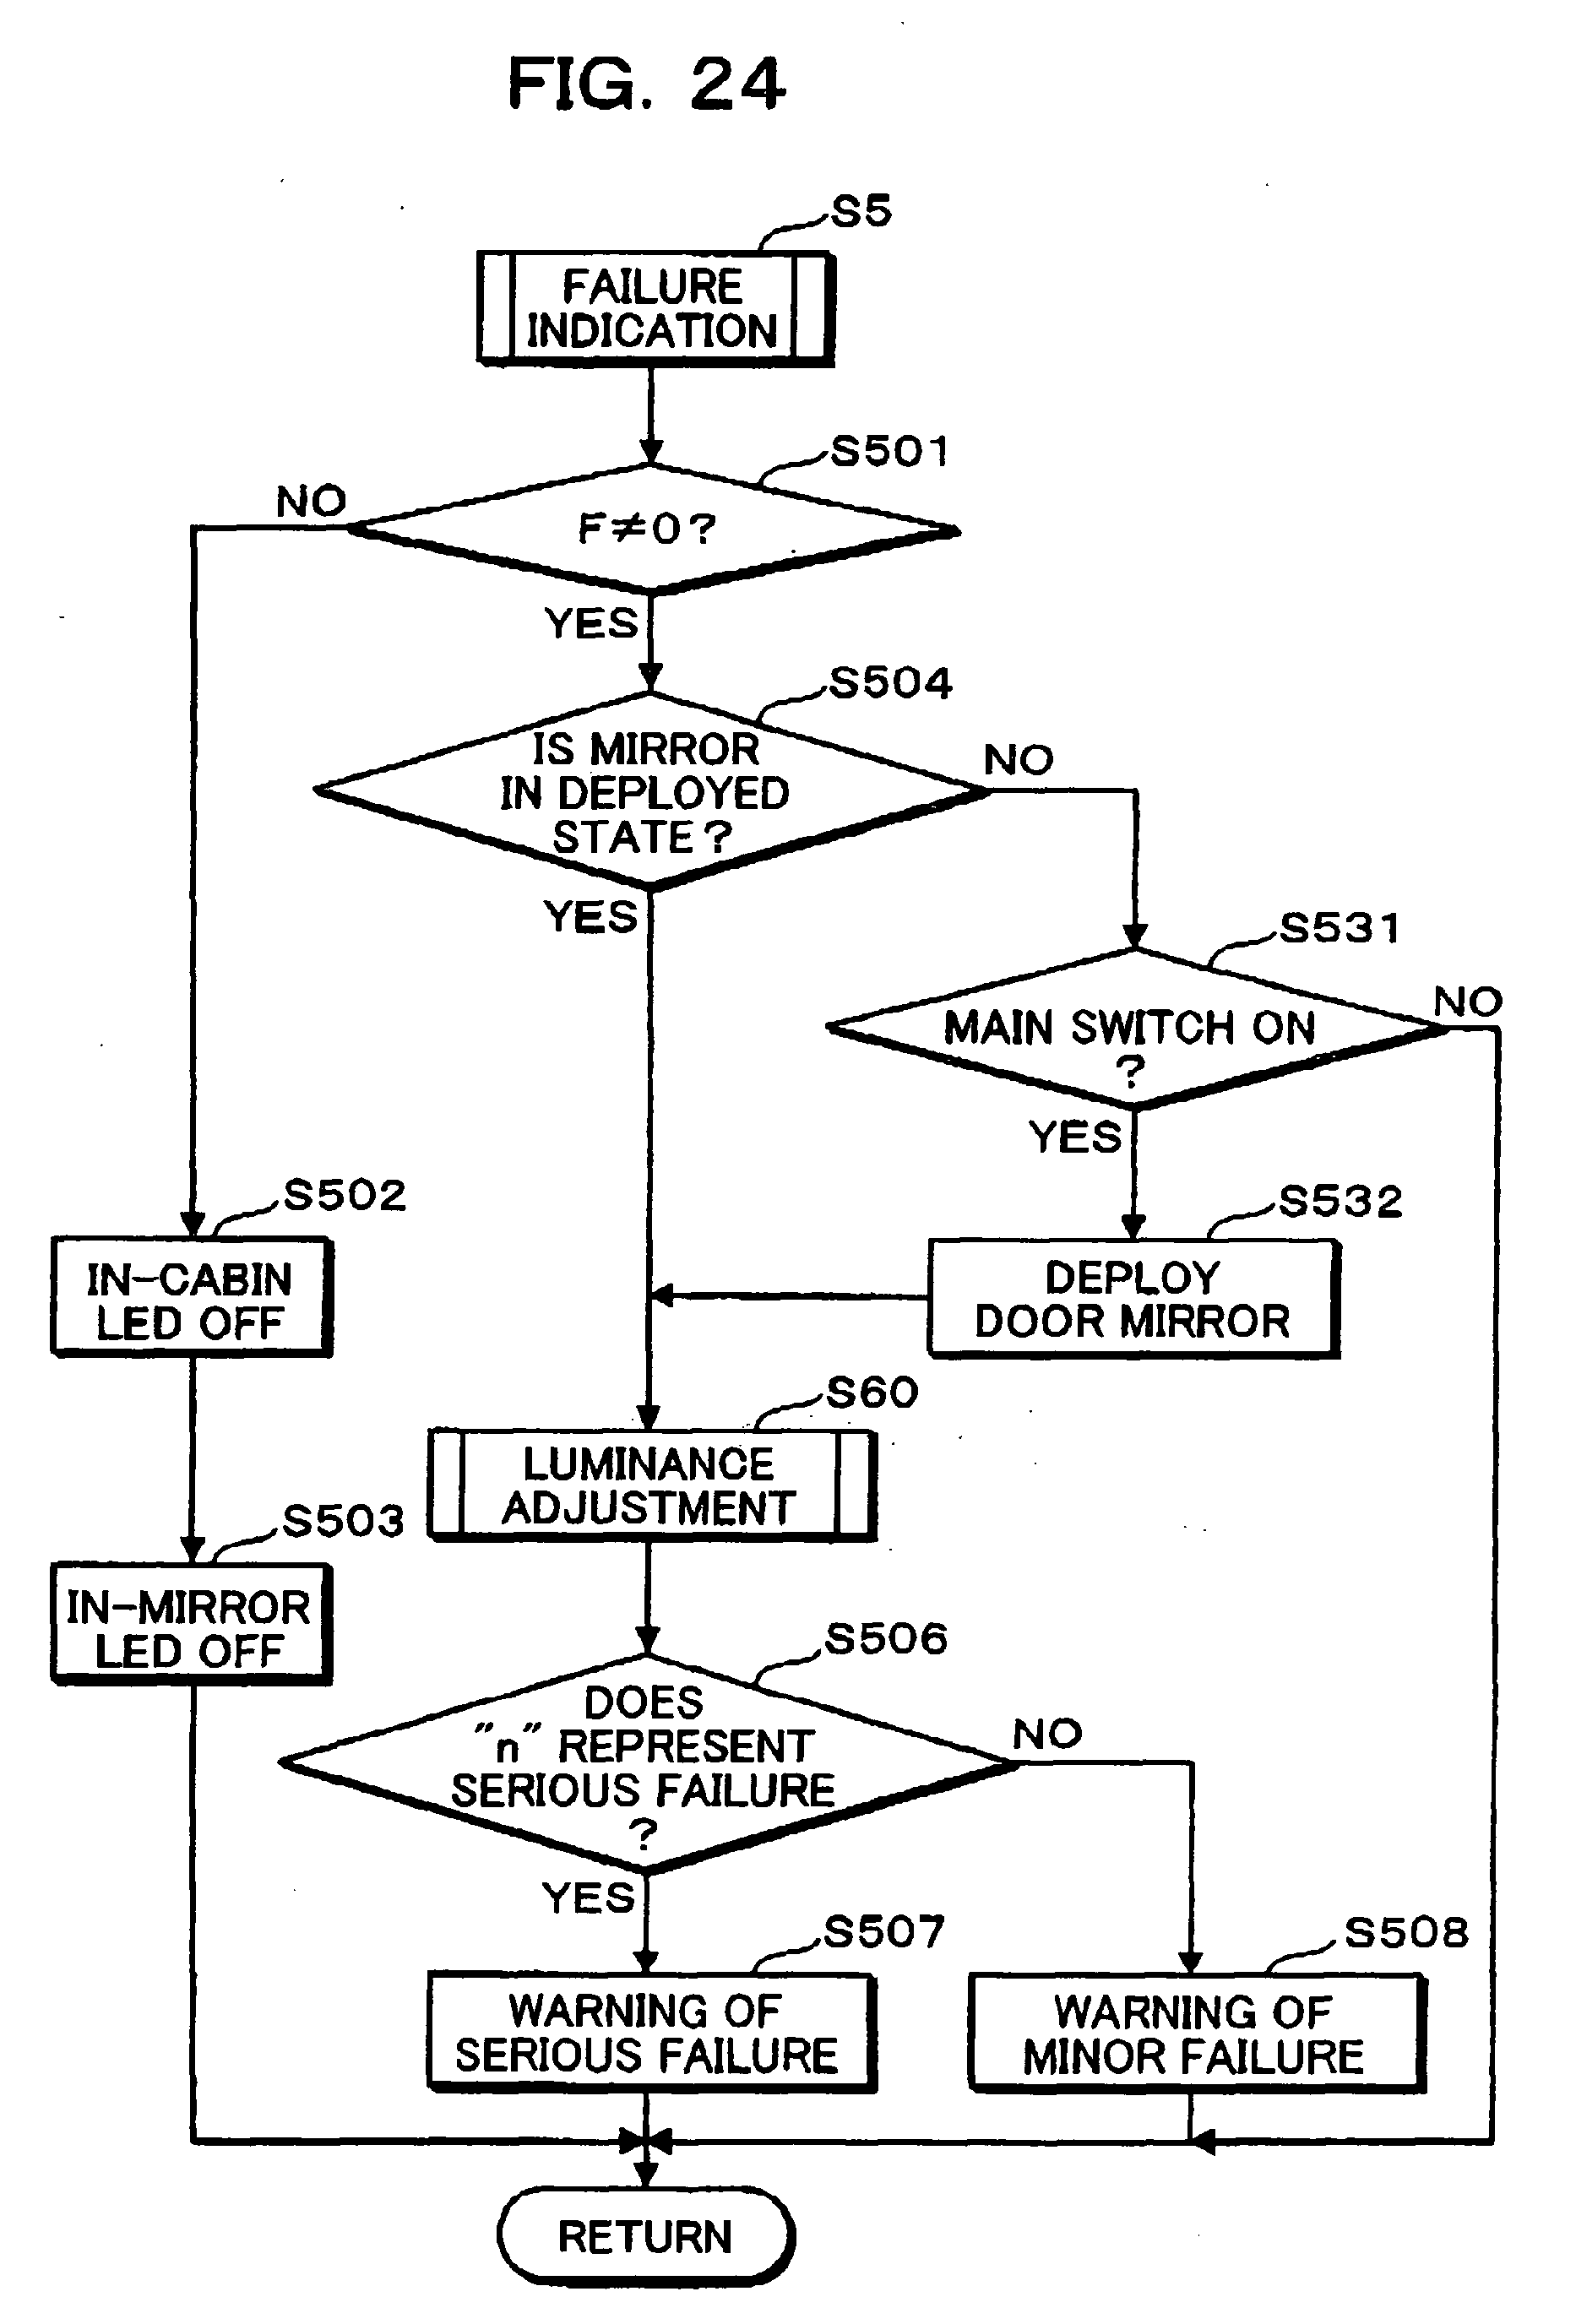 Wiring diagram for a gm ls1 ls6 map sensor wiring jzgreentown